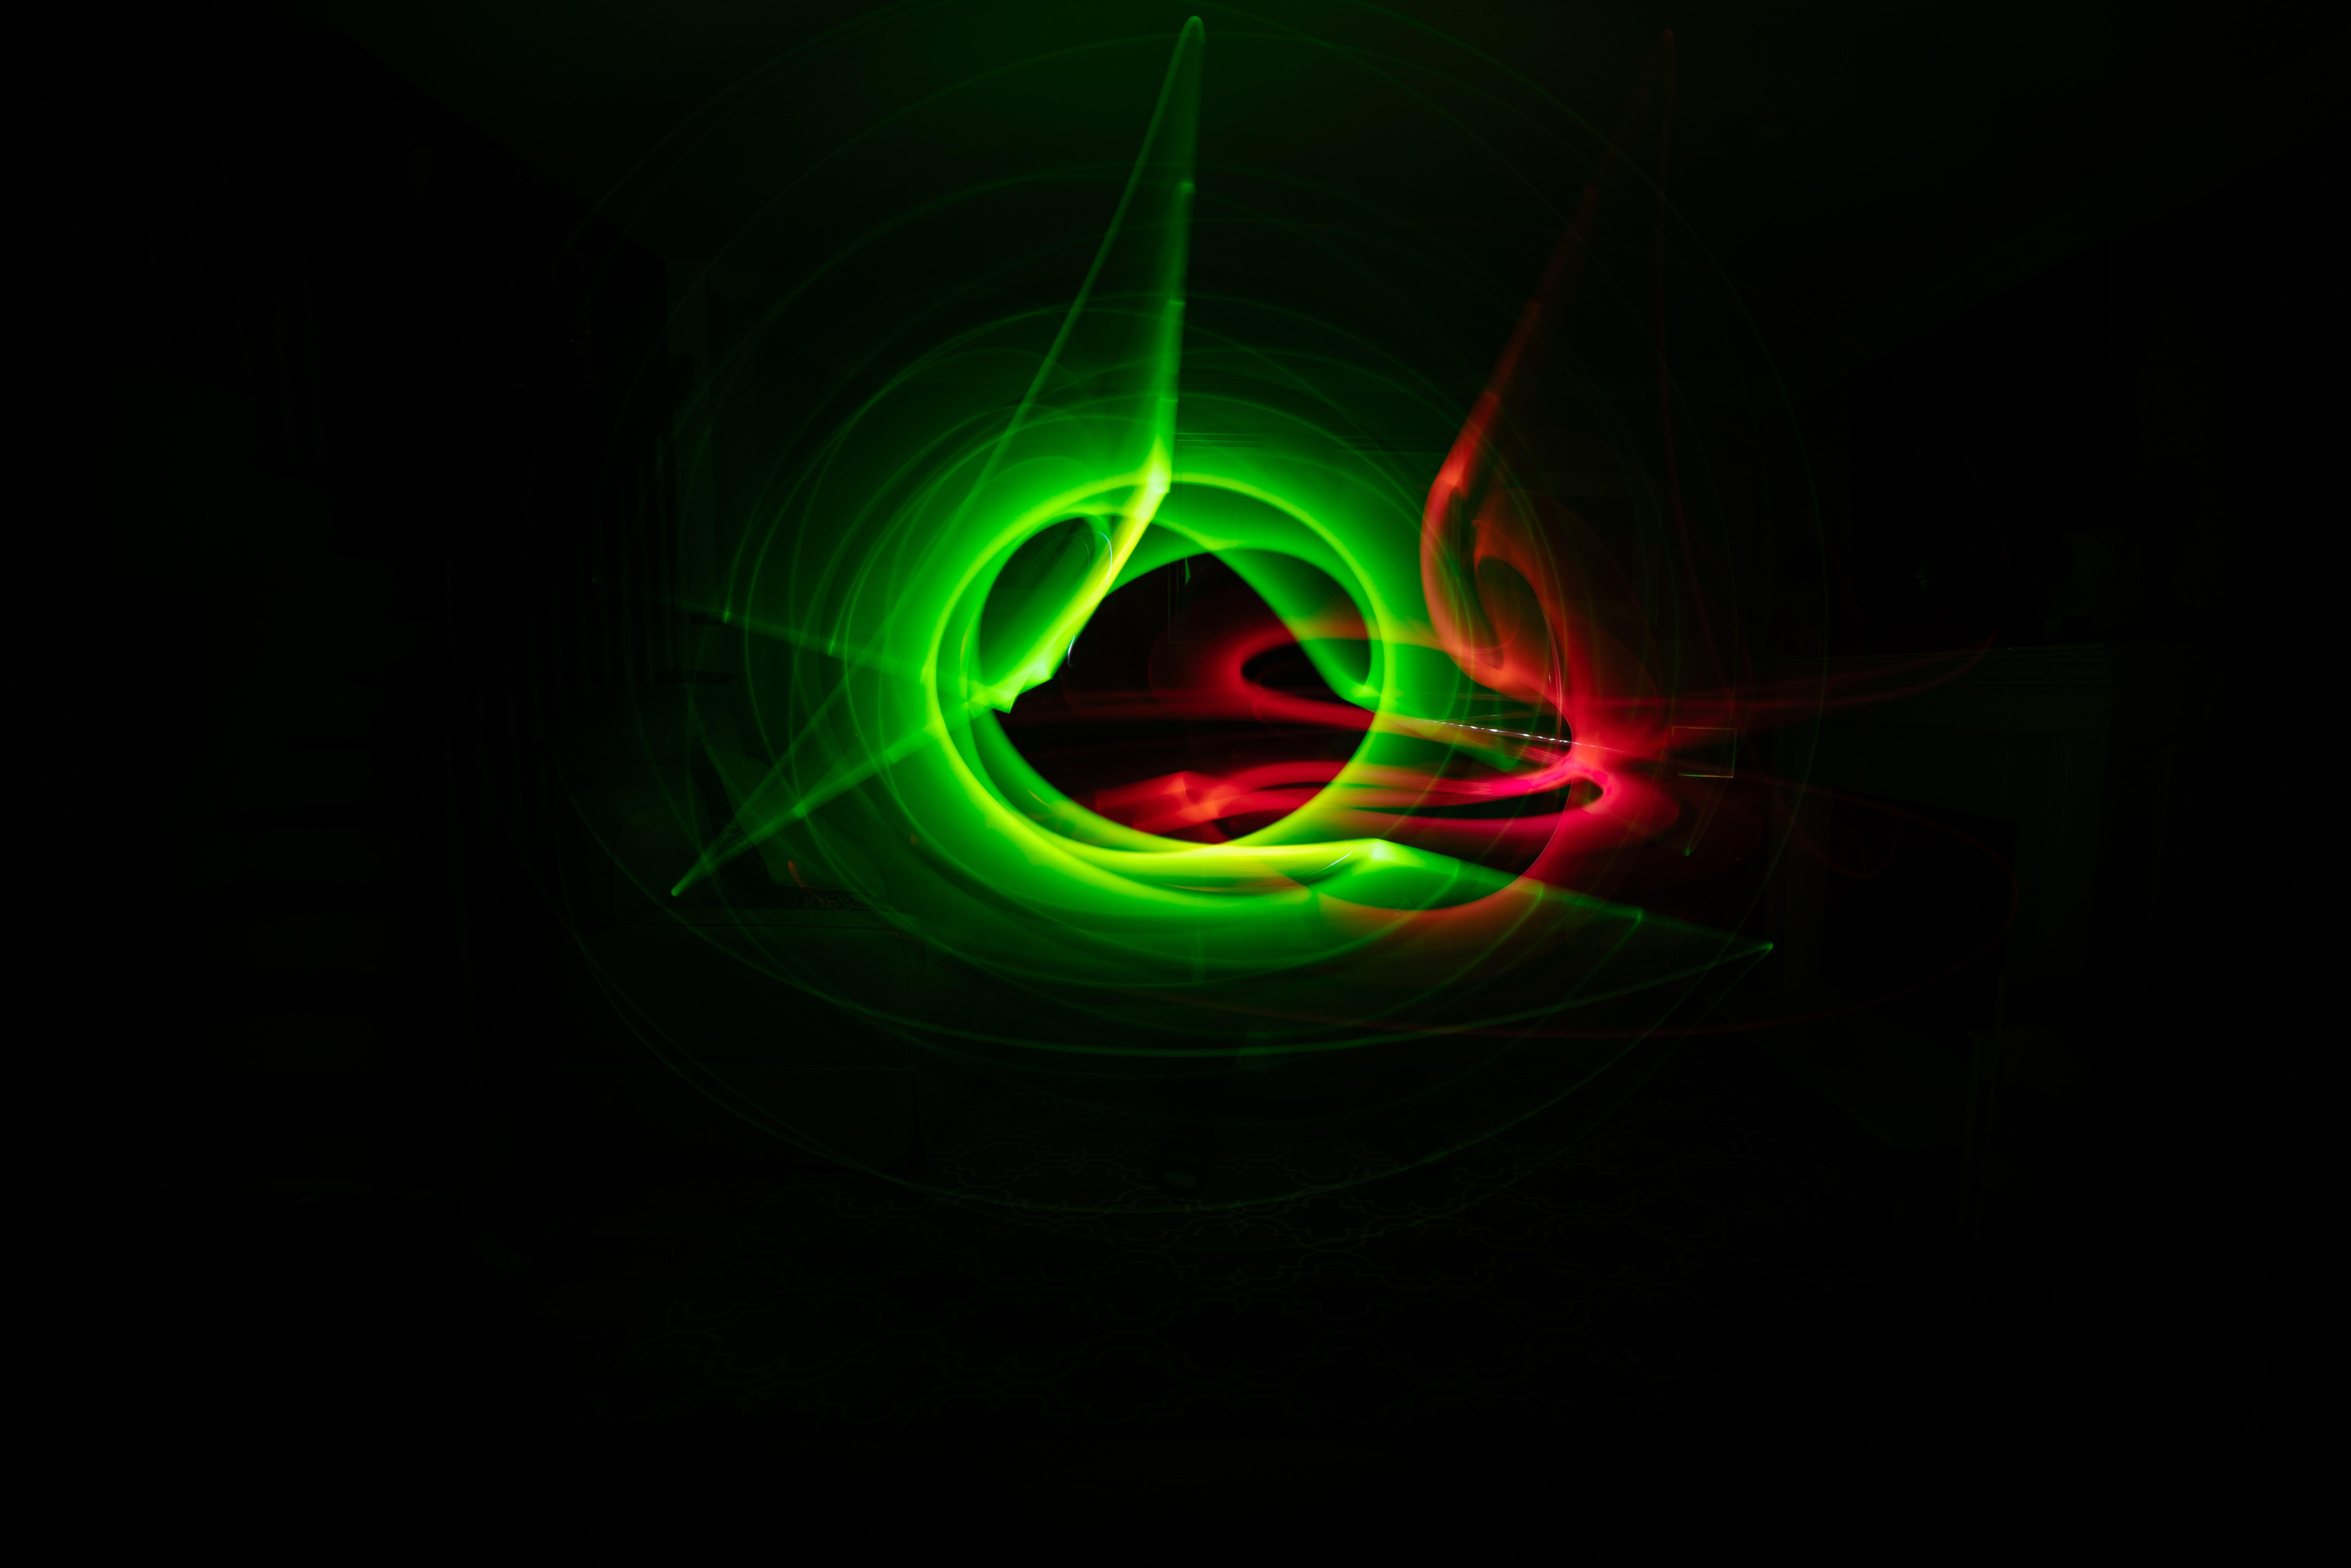 red, black, and green digital wallpaper